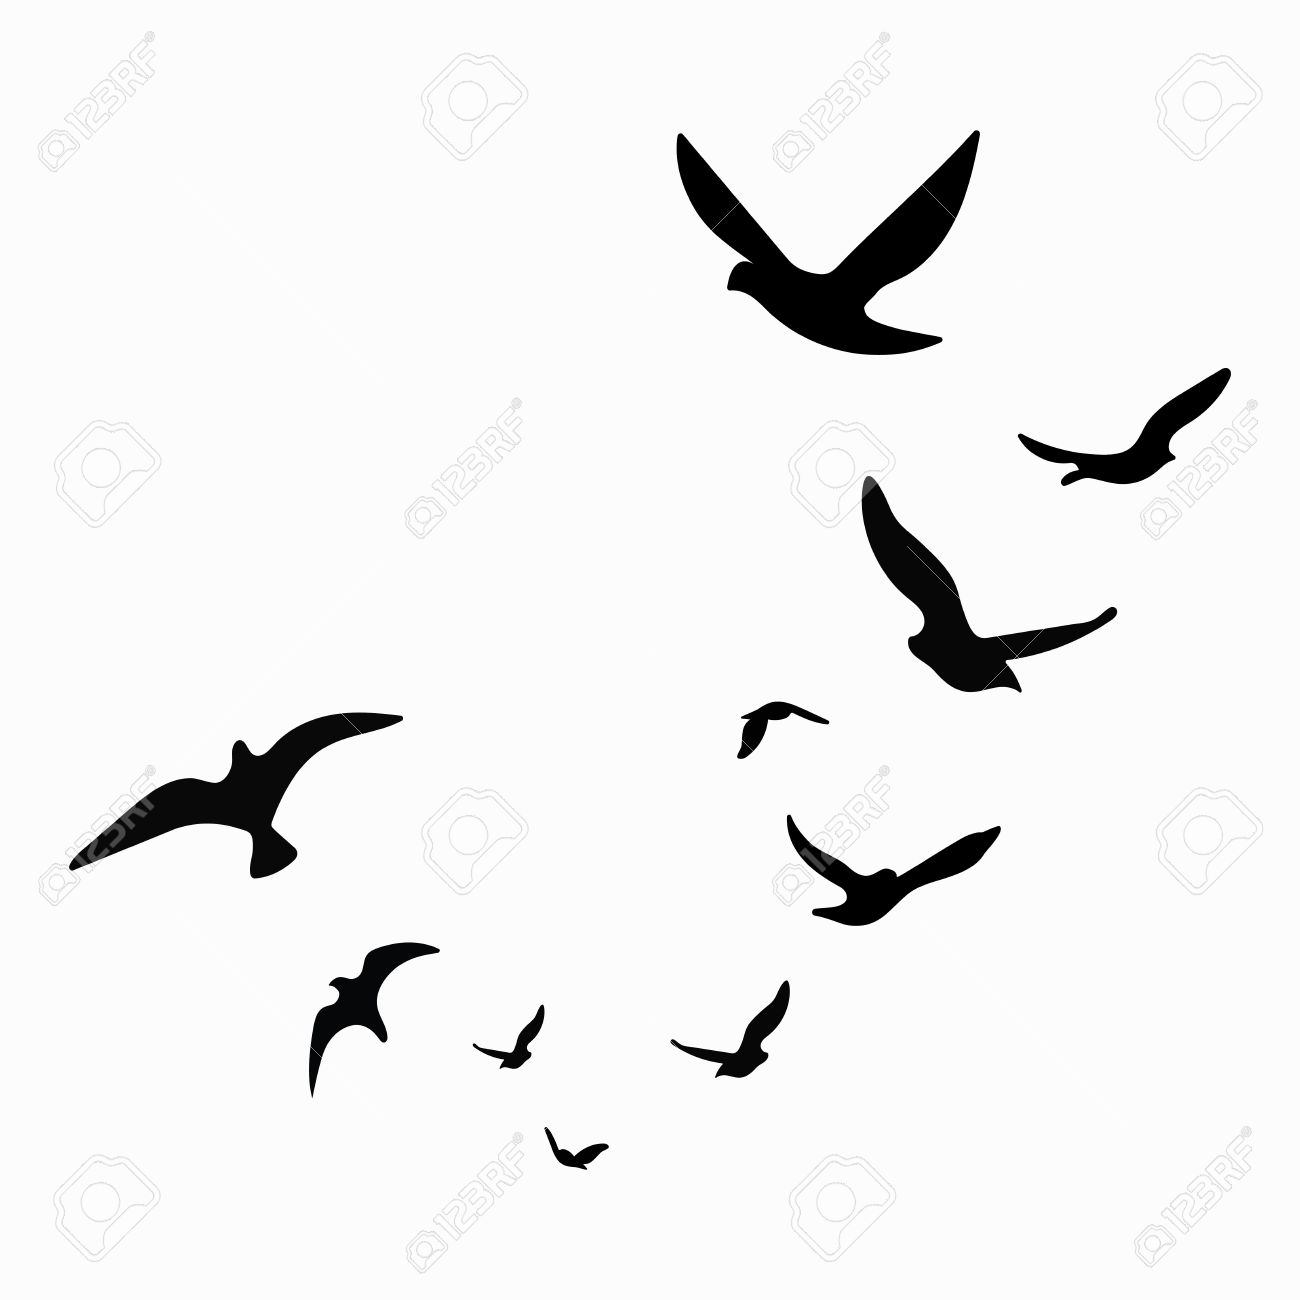 Birds Silhouette At Getdrawings